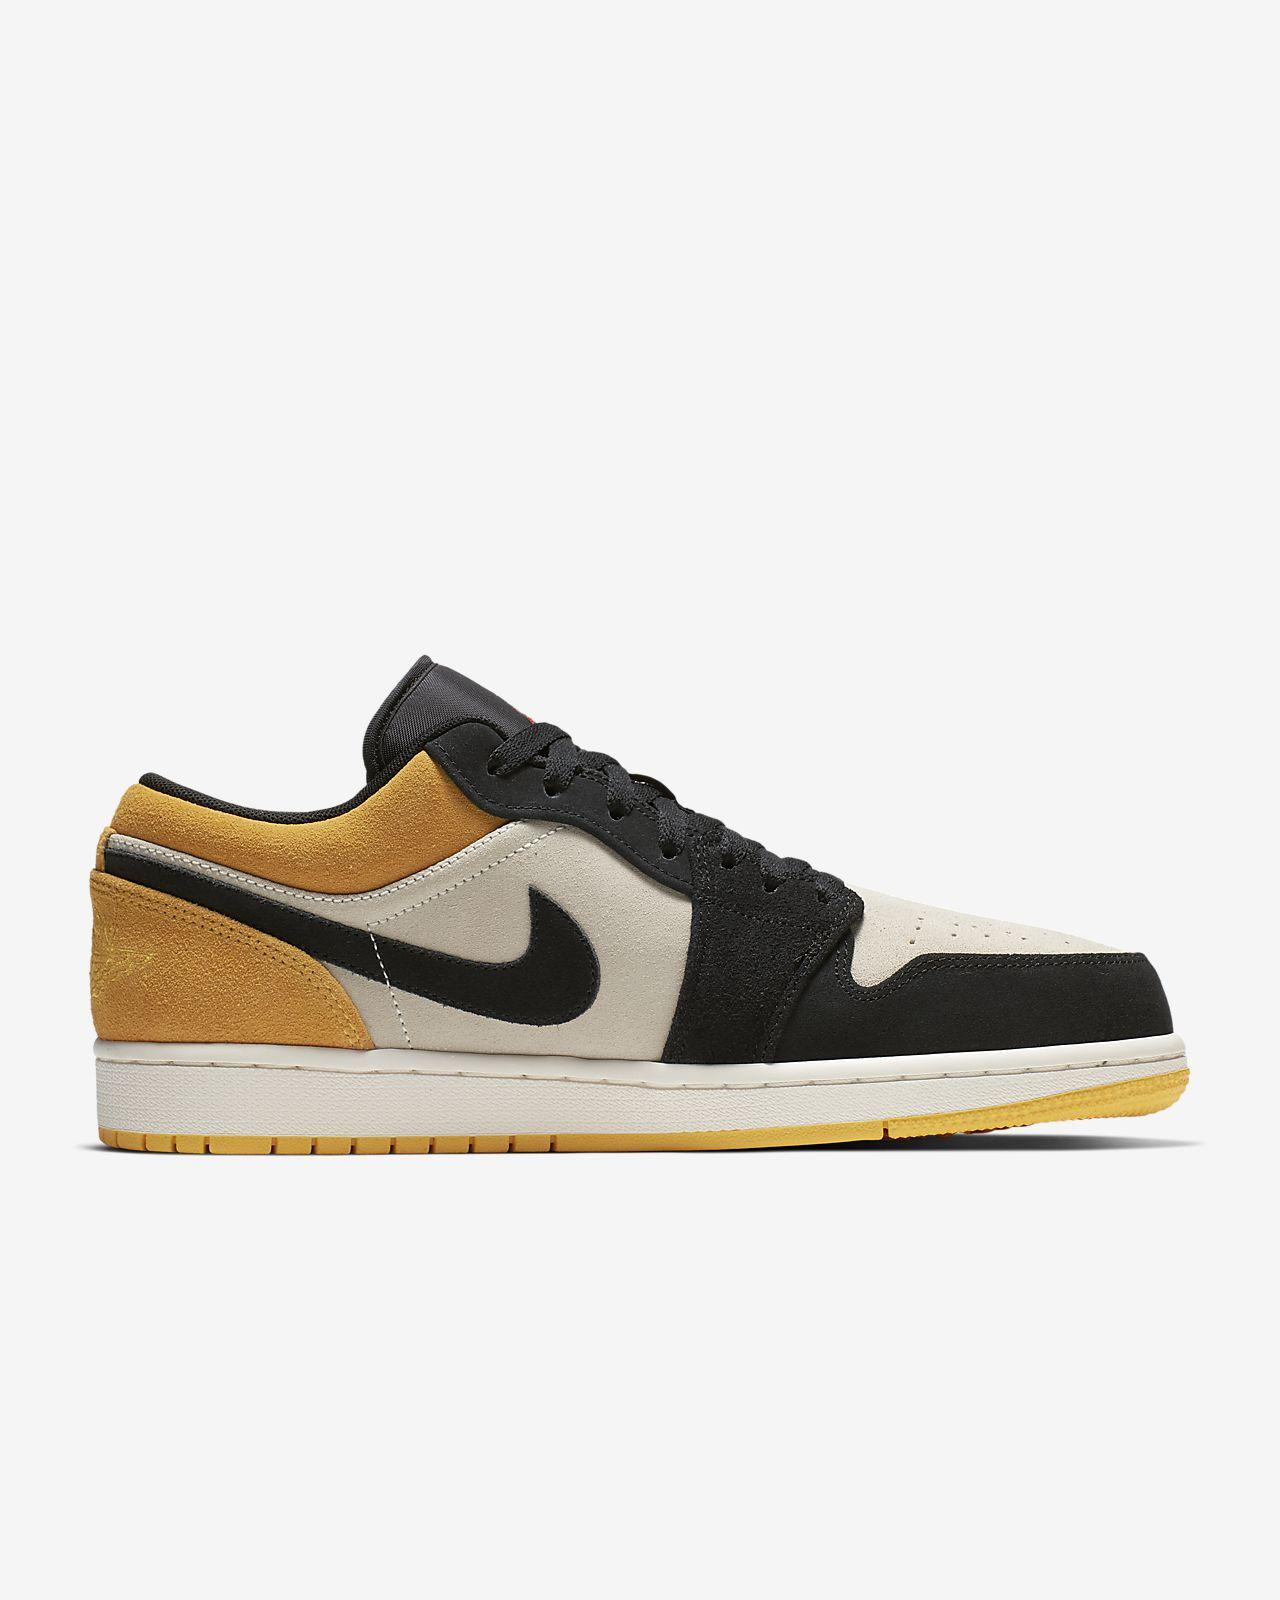 f70891456ebec Chaussure Air Jordan 1 Low pour Homme. Nike.com CA